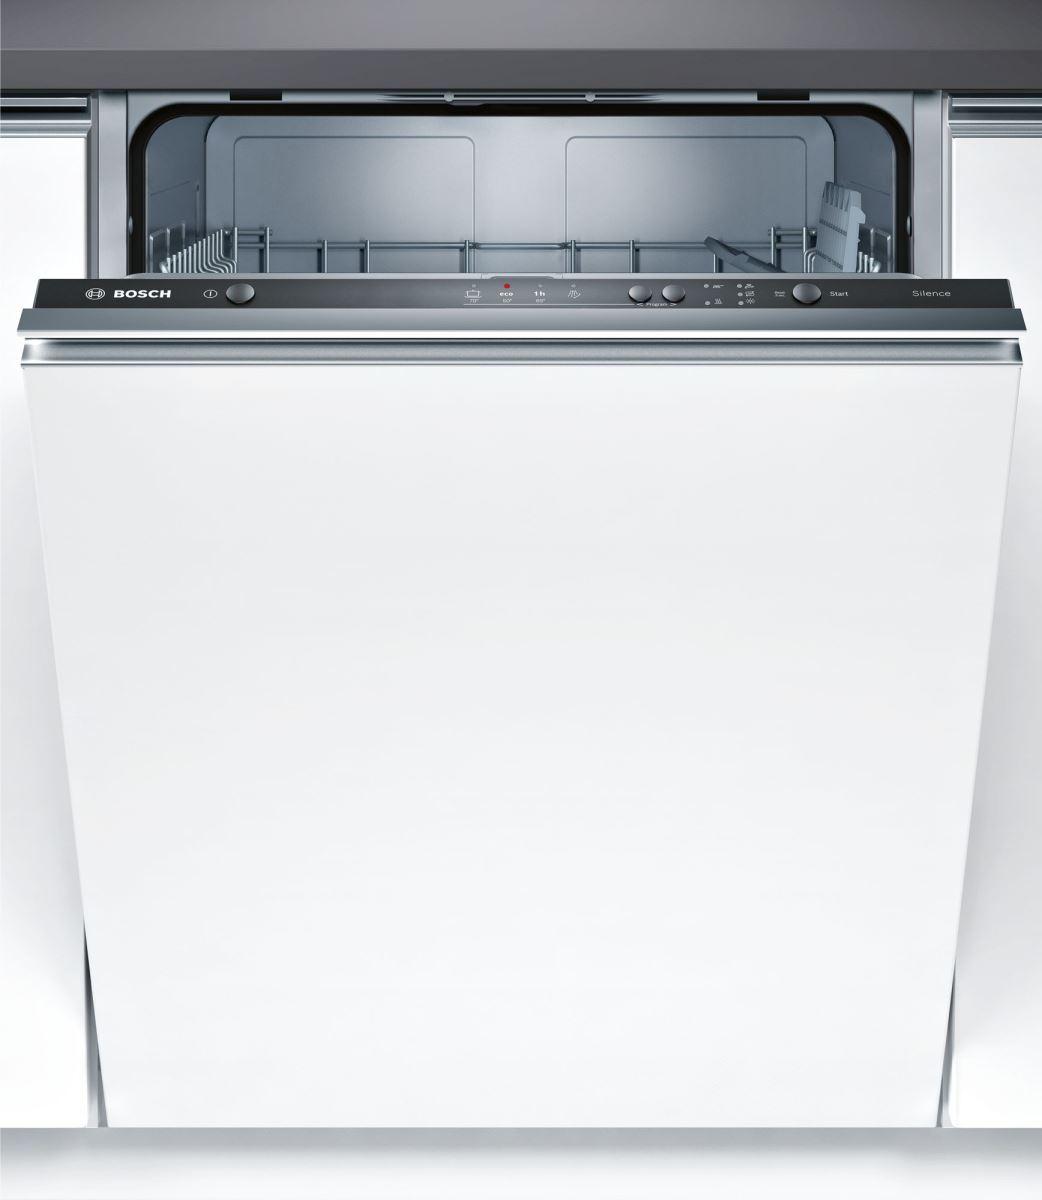 Masina de spalat vase incorporabila Bosch SMV24AX01E Serie 2, 60 cm, 12 seturi, clasa A+, 4 programe, EcoSilence Drive